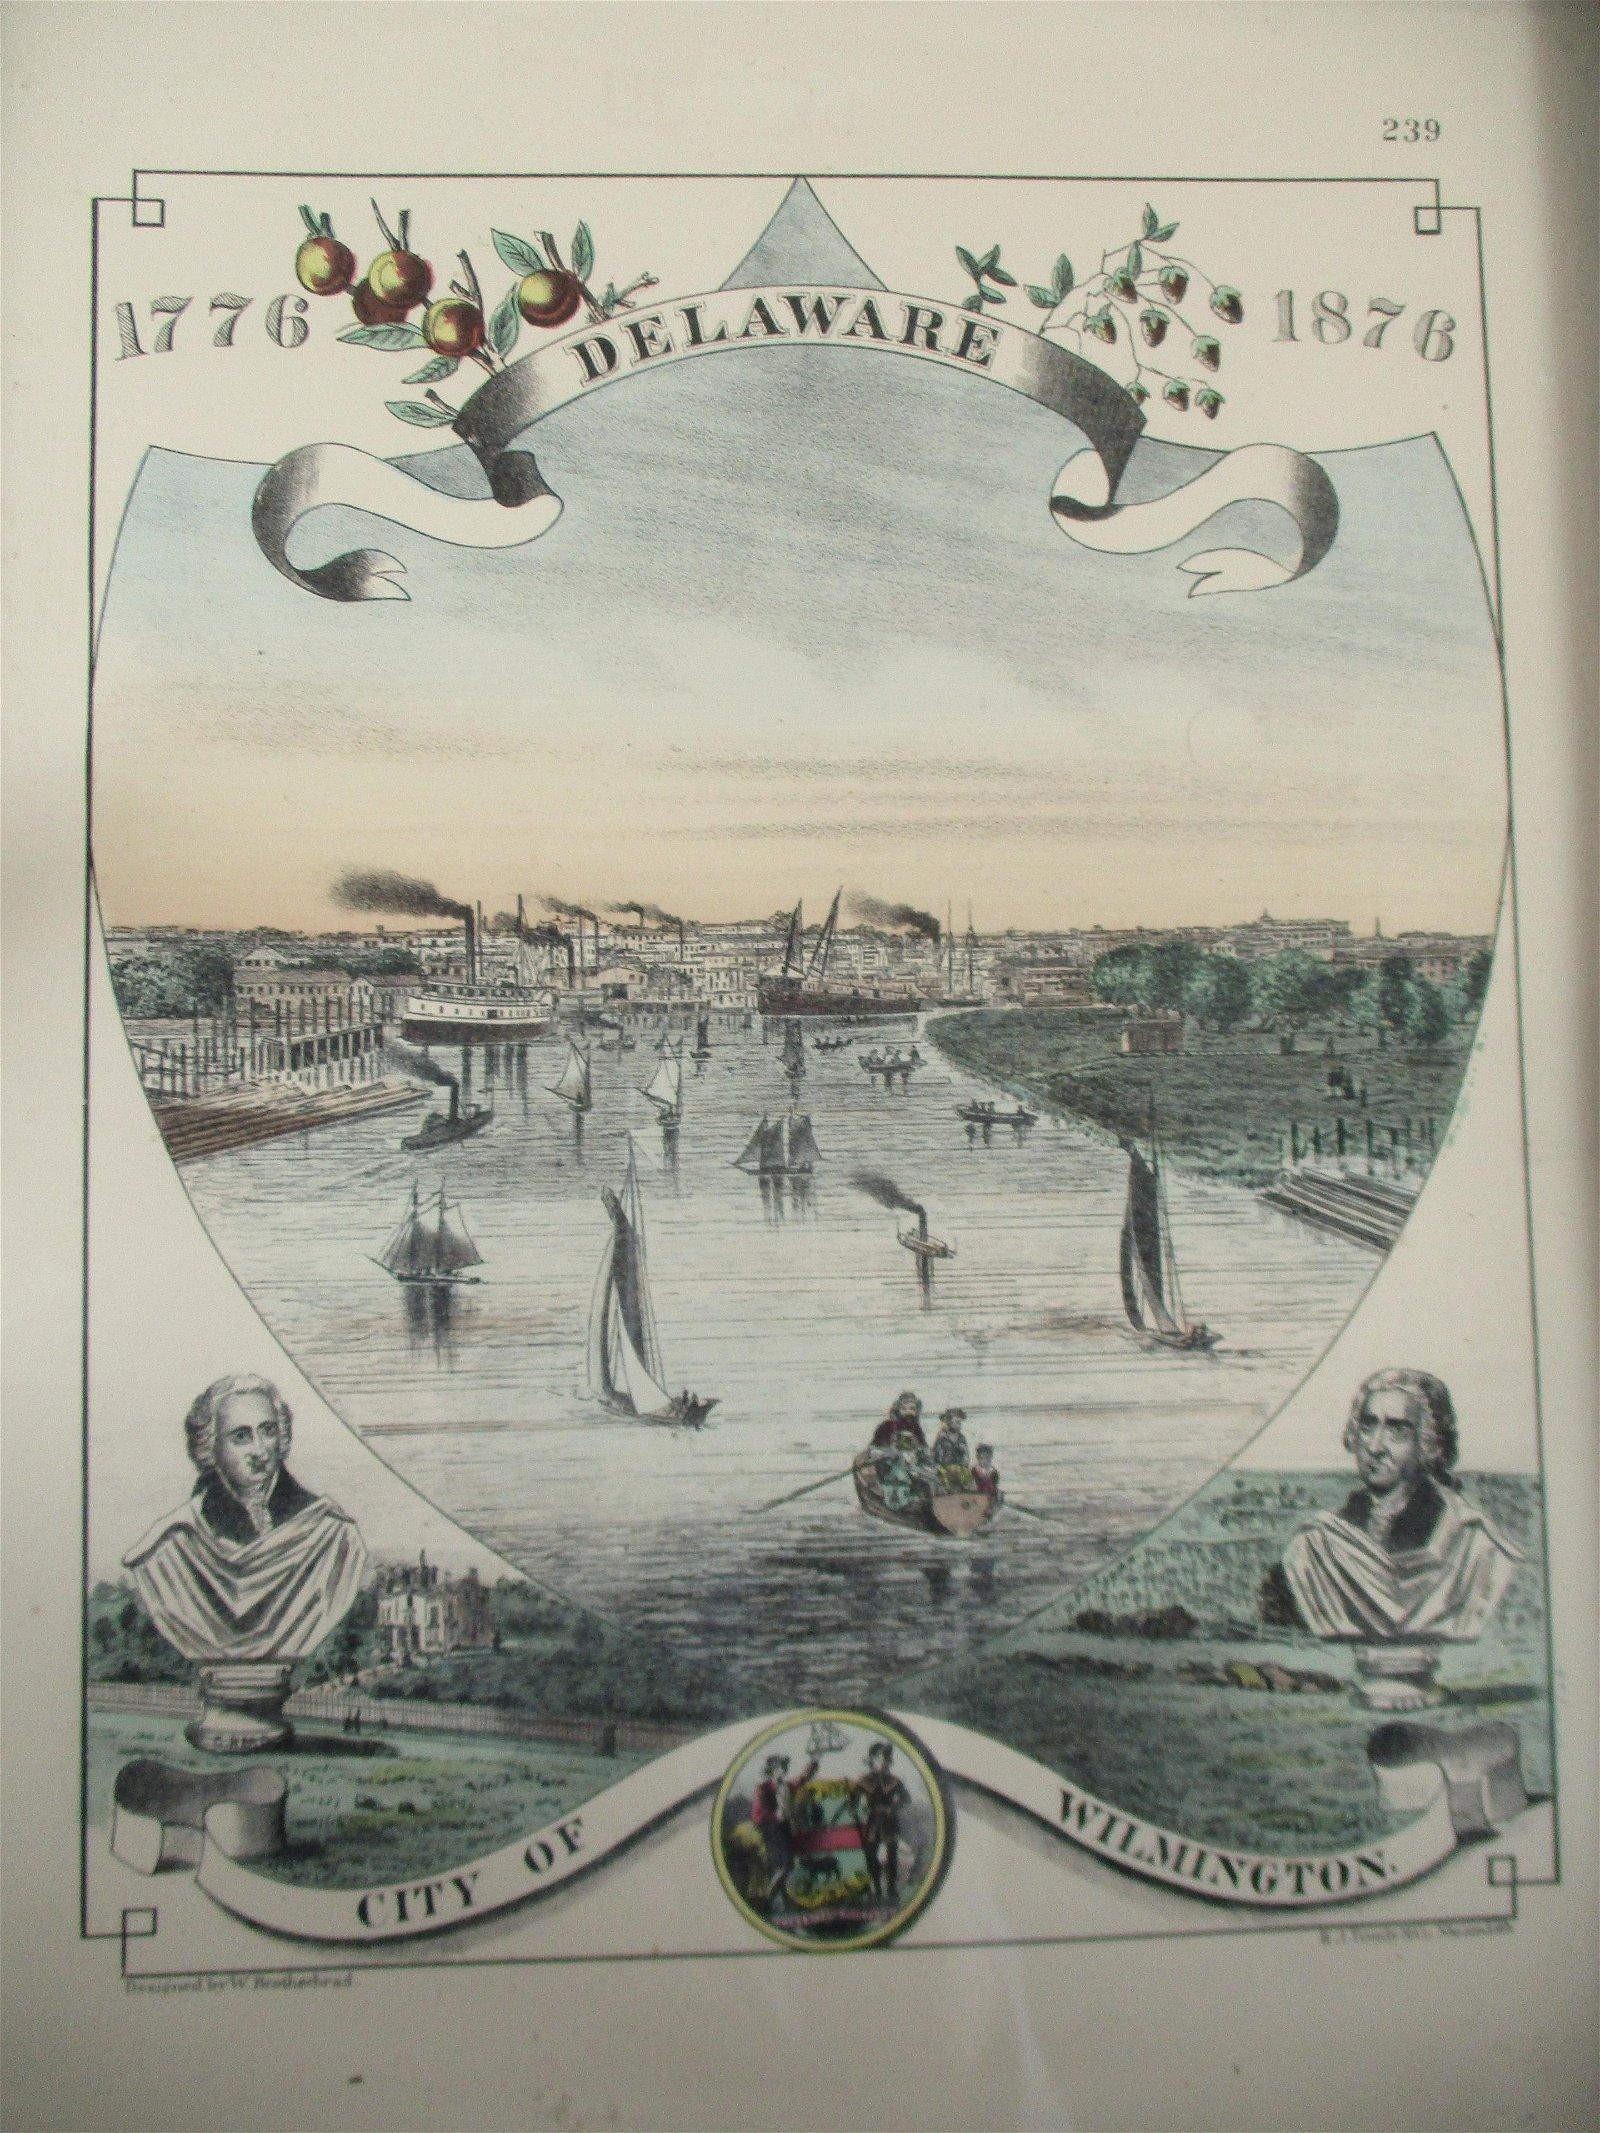 City of Wilmington Delaware - Brotherhead